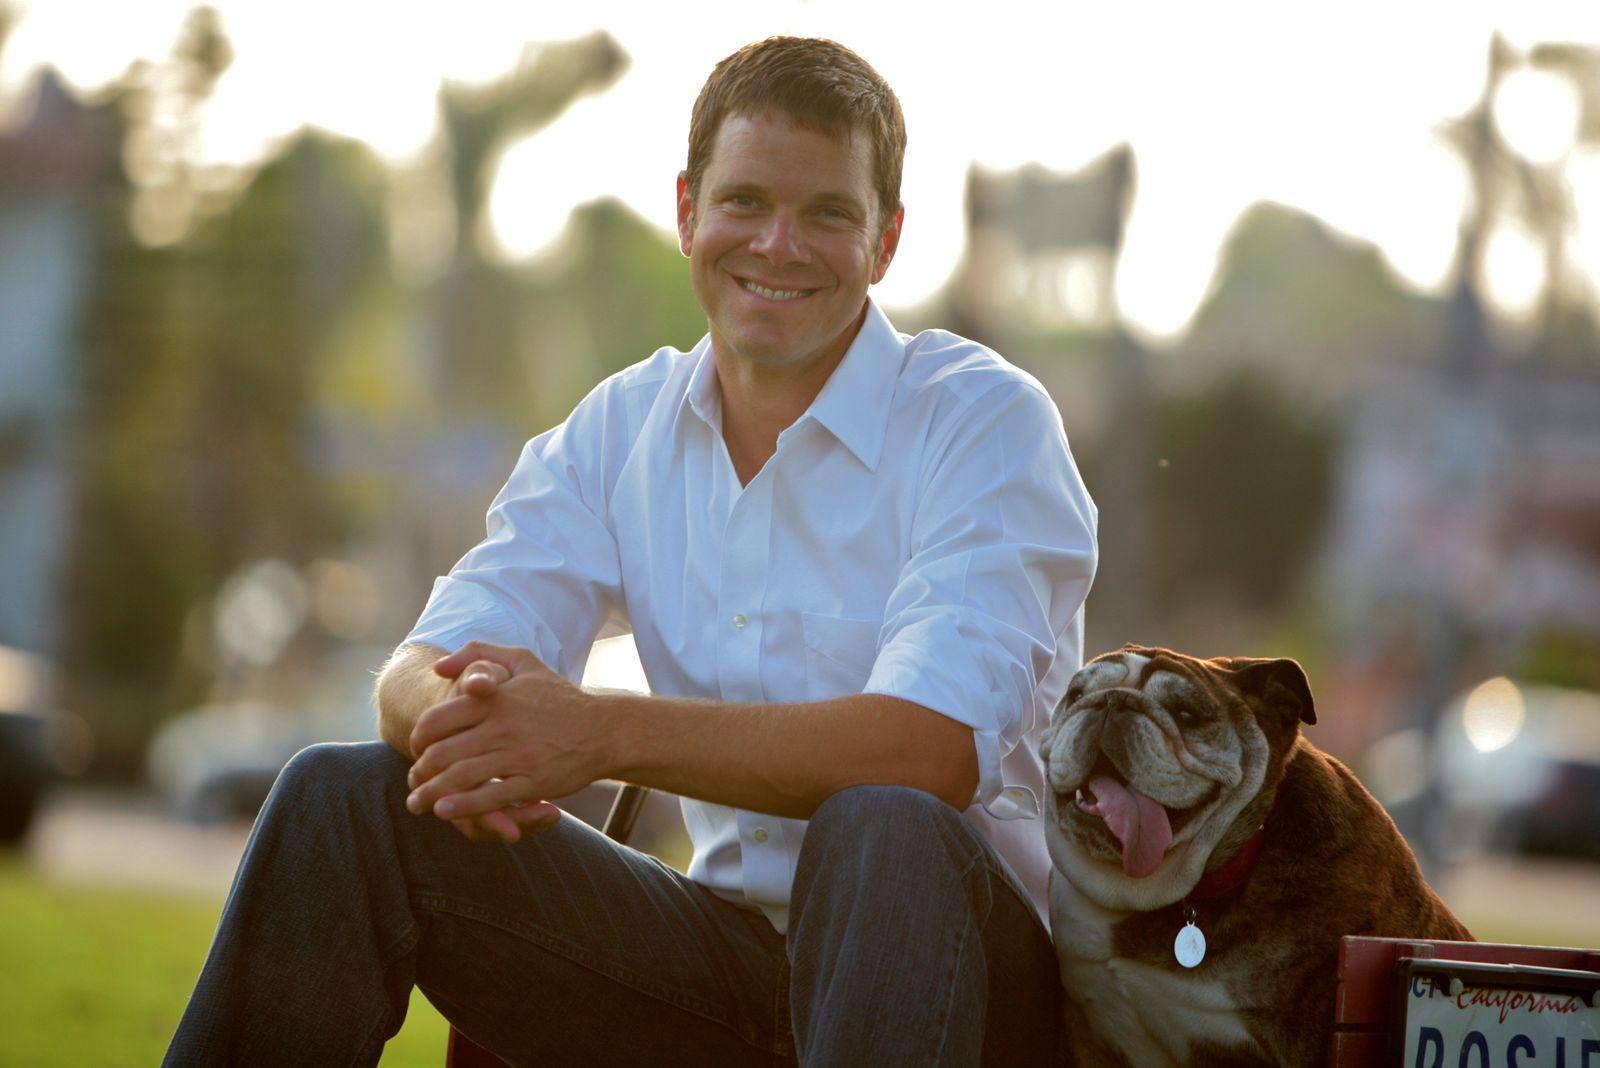 Justin Rudd, Community Action Team Founder